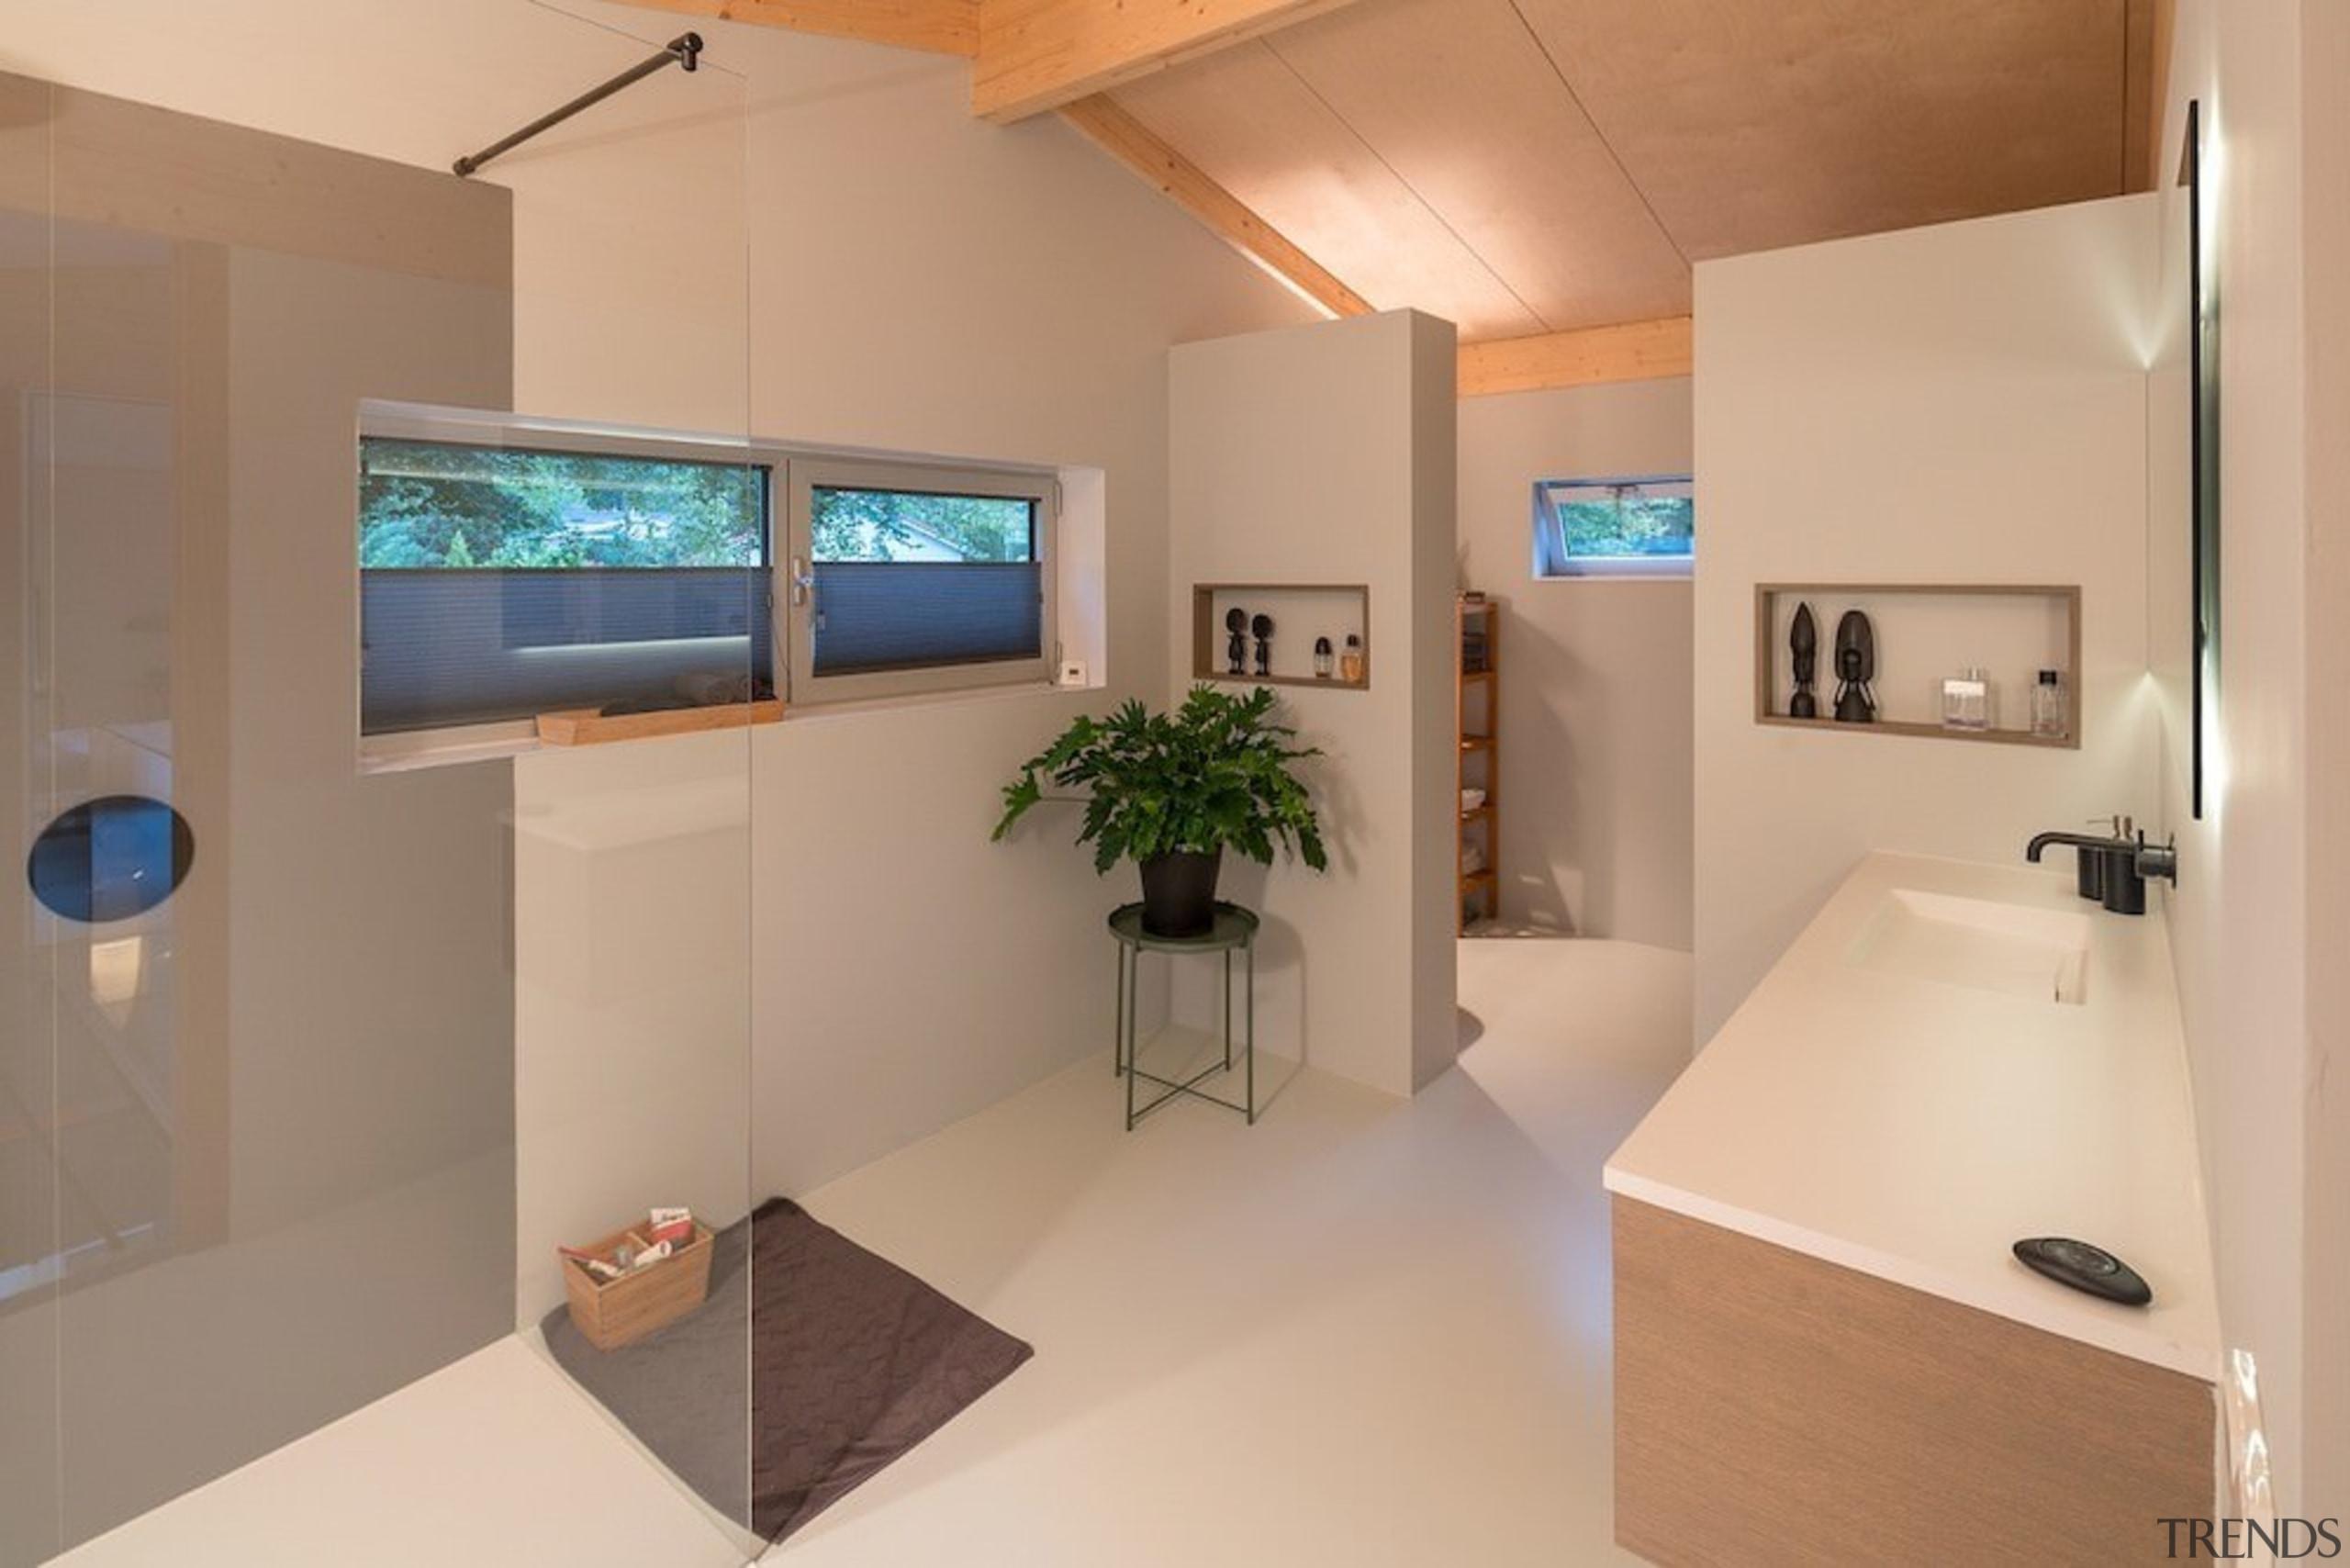 This bathroom has a large walk-in shower - interior design, product design, real estate, room, orange